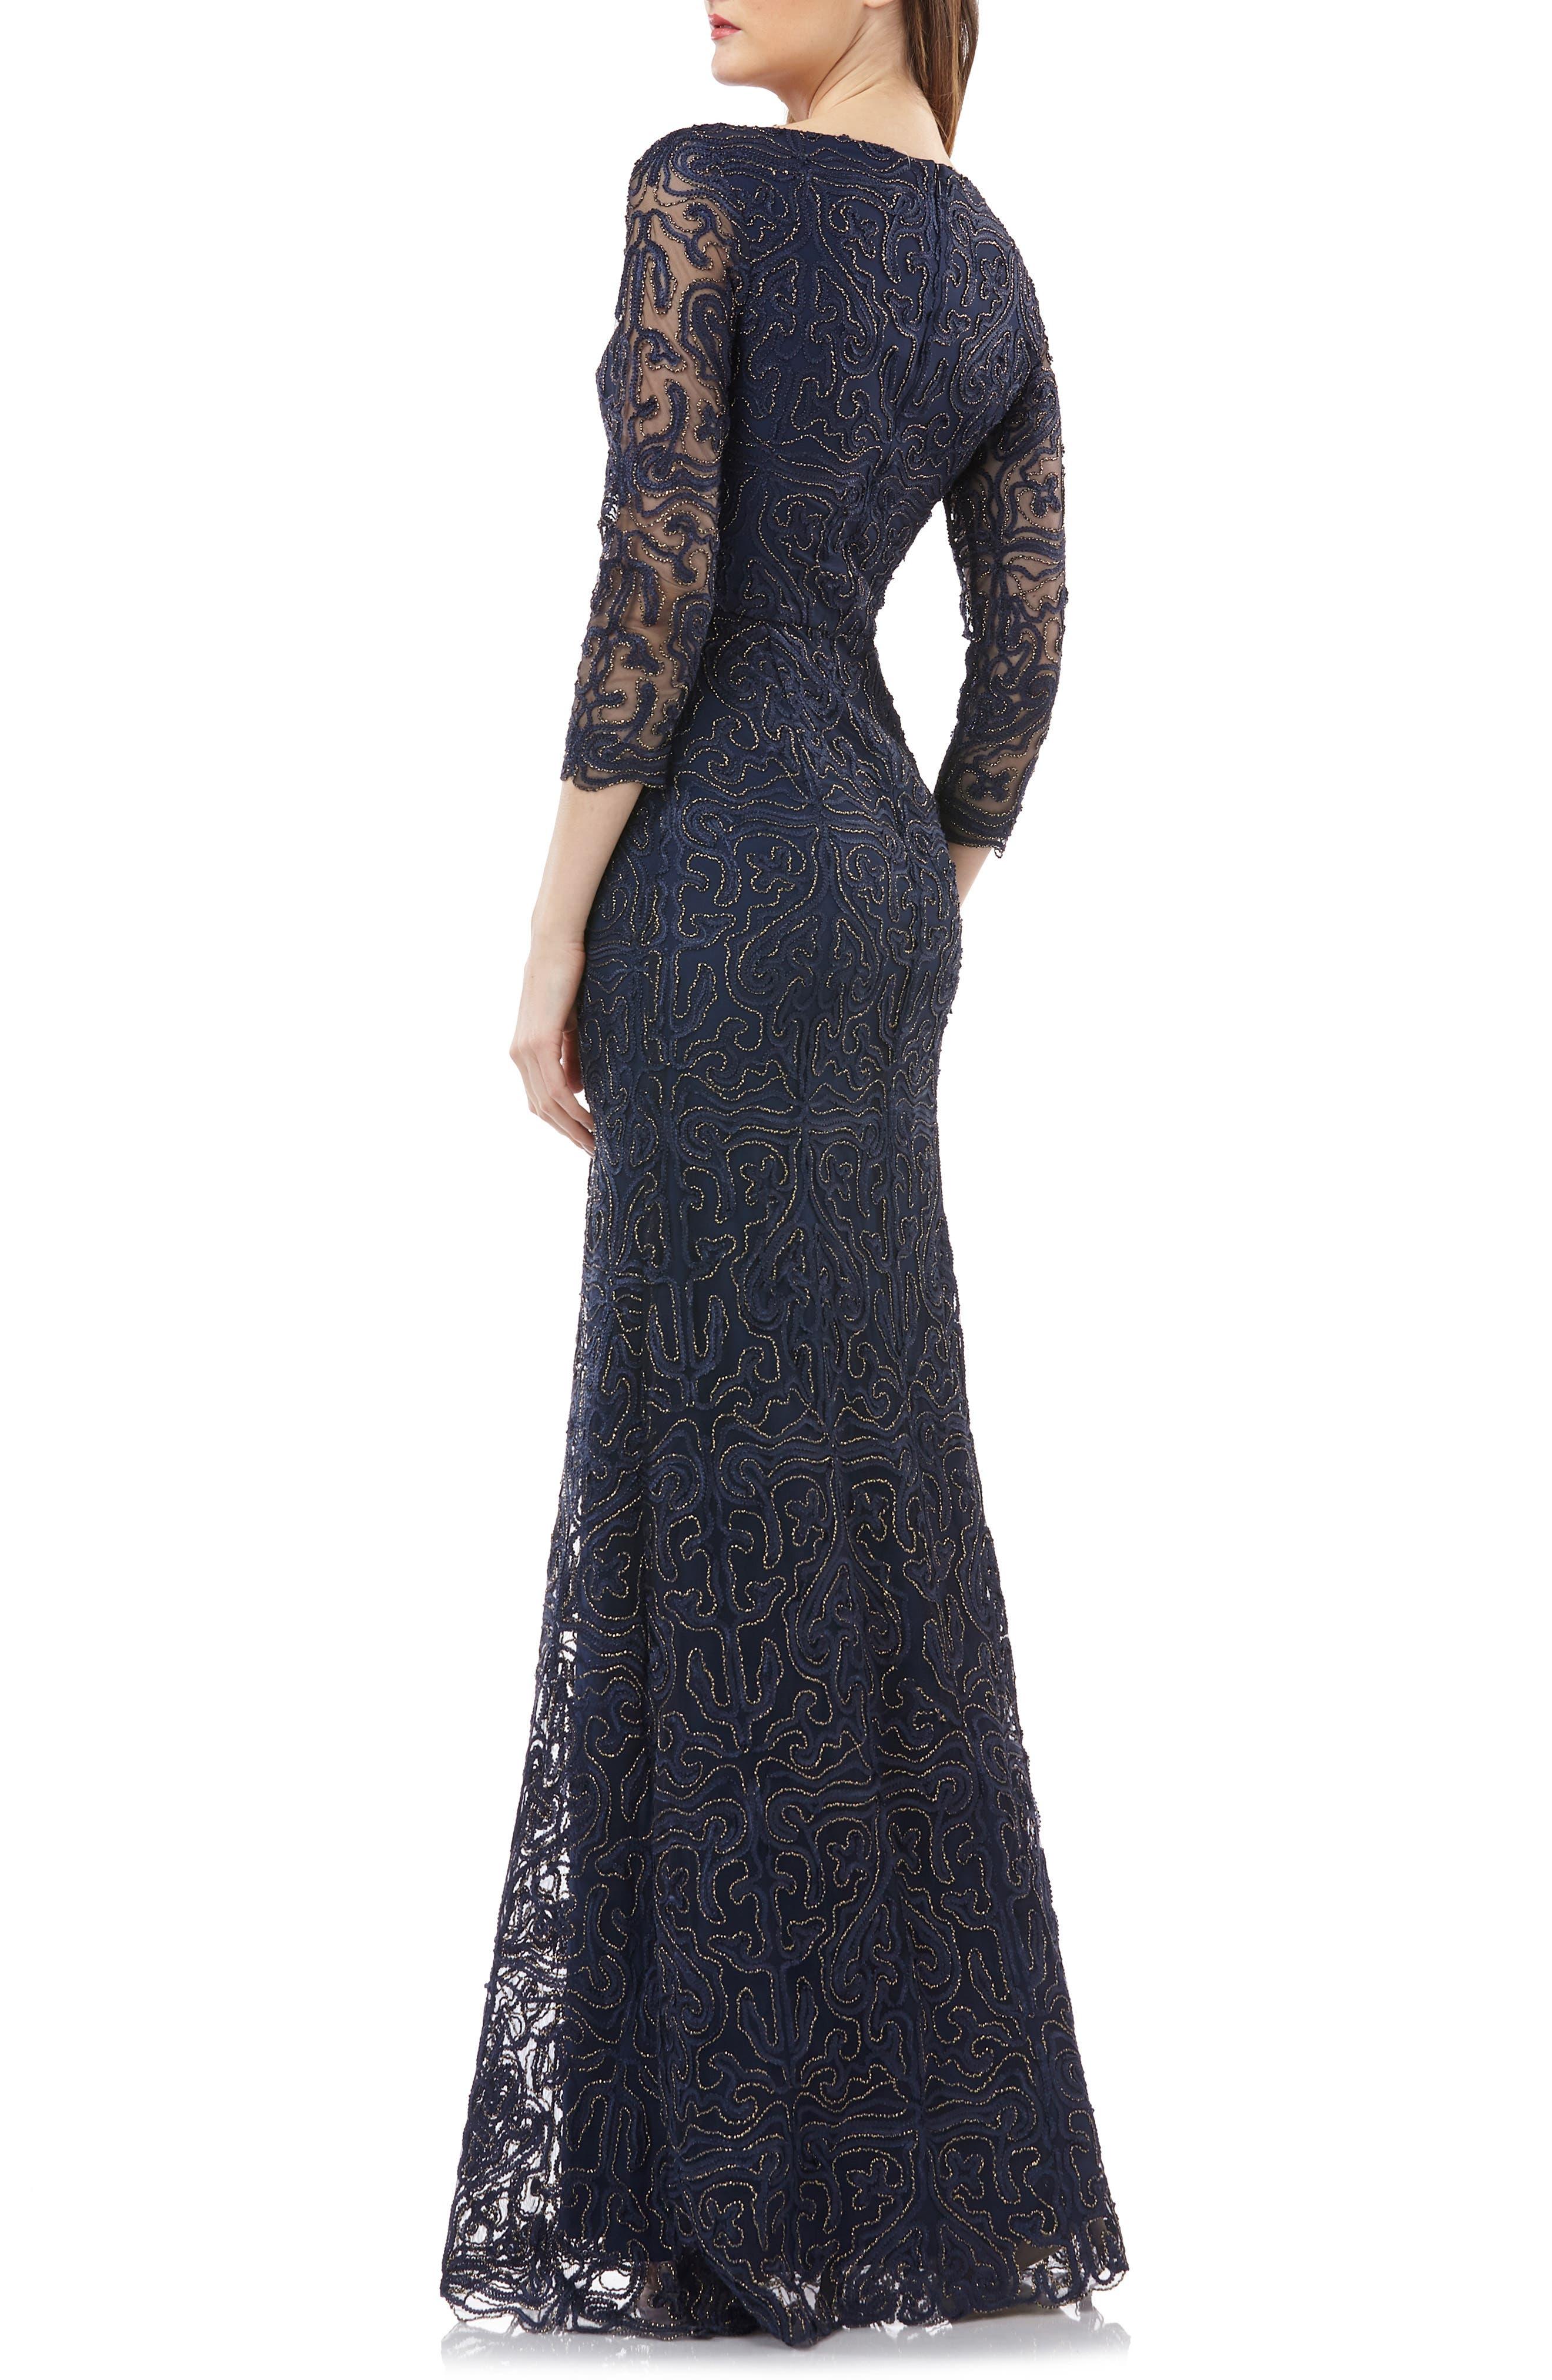 Metallic Soutache Evening Dress,                             Alternate thumbnail 2, color,                             NAVY/ GOLD